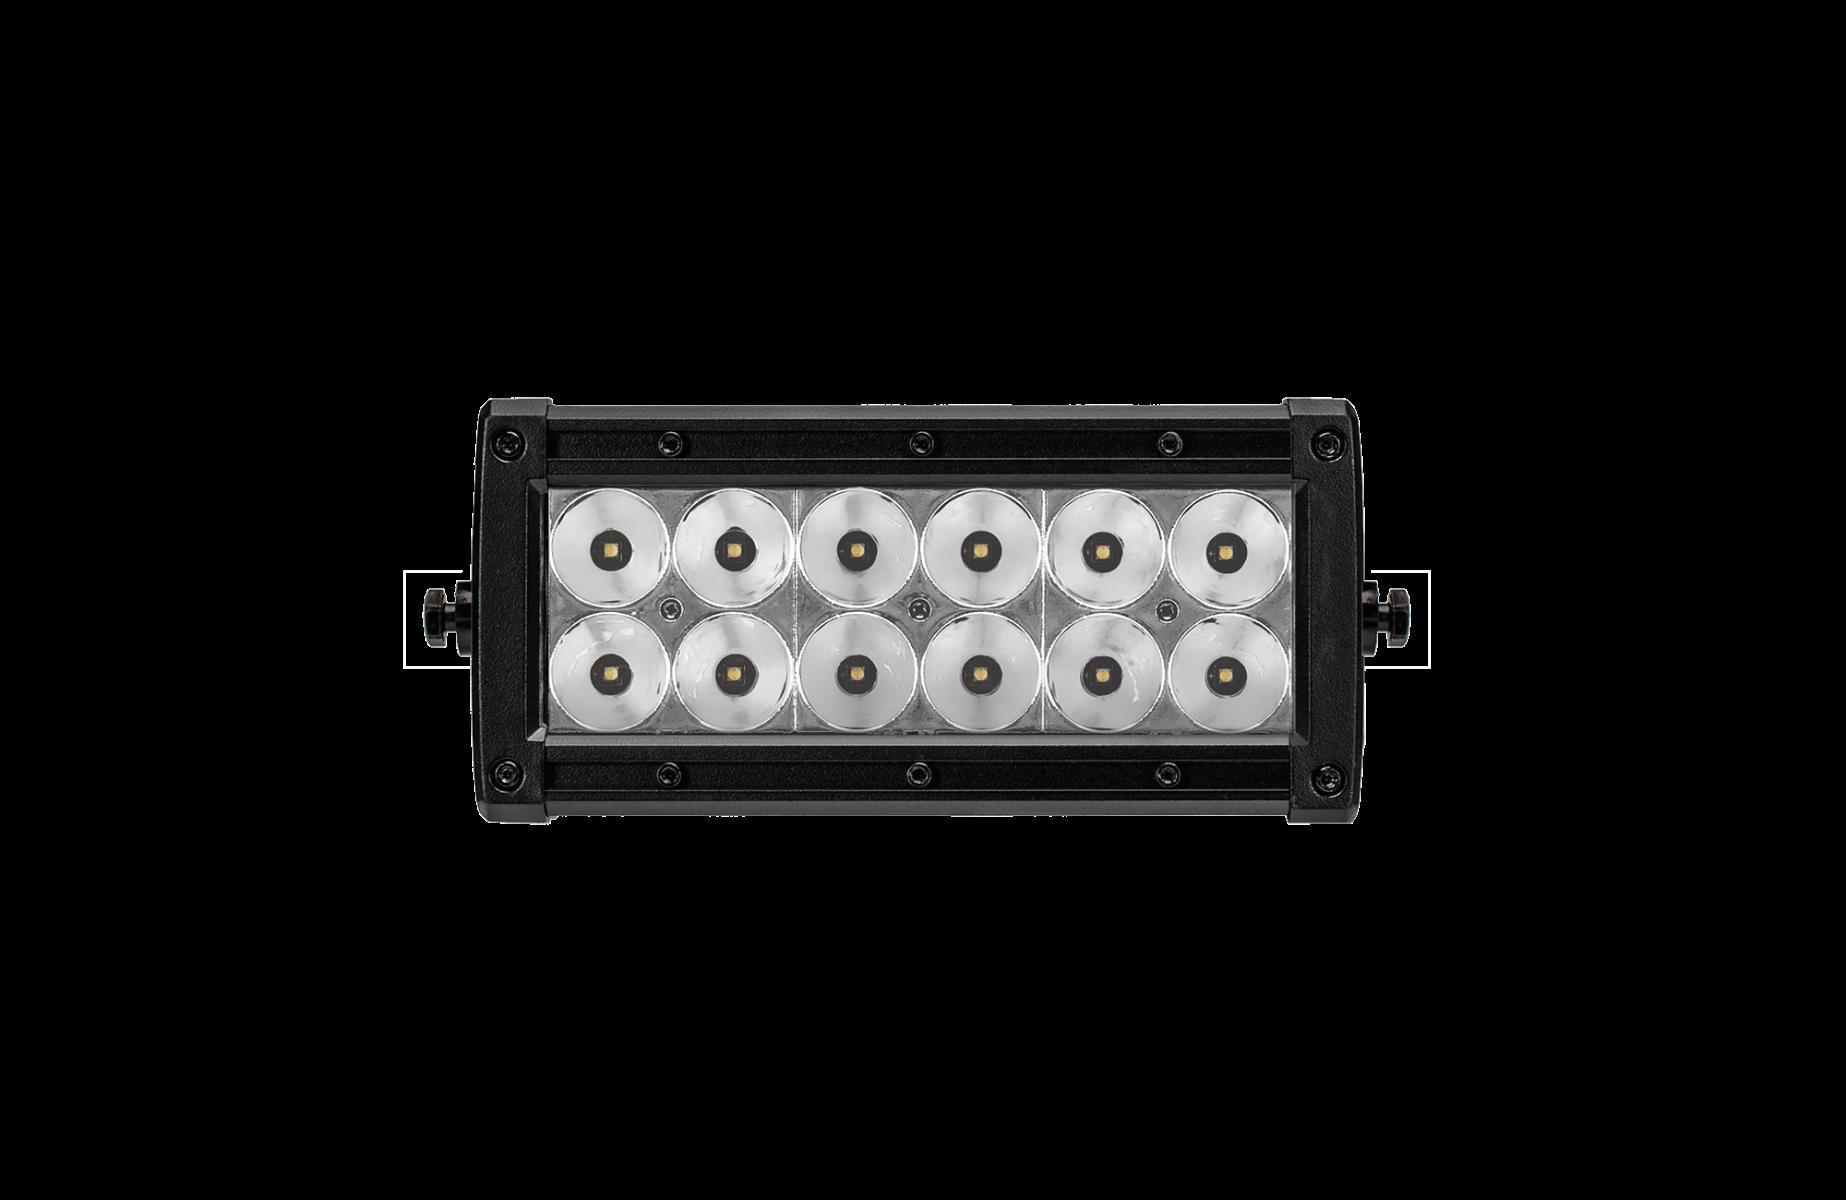 6 Inch LED Light Bar Dual Row Combo Beam Nightfall Collection Lightforce